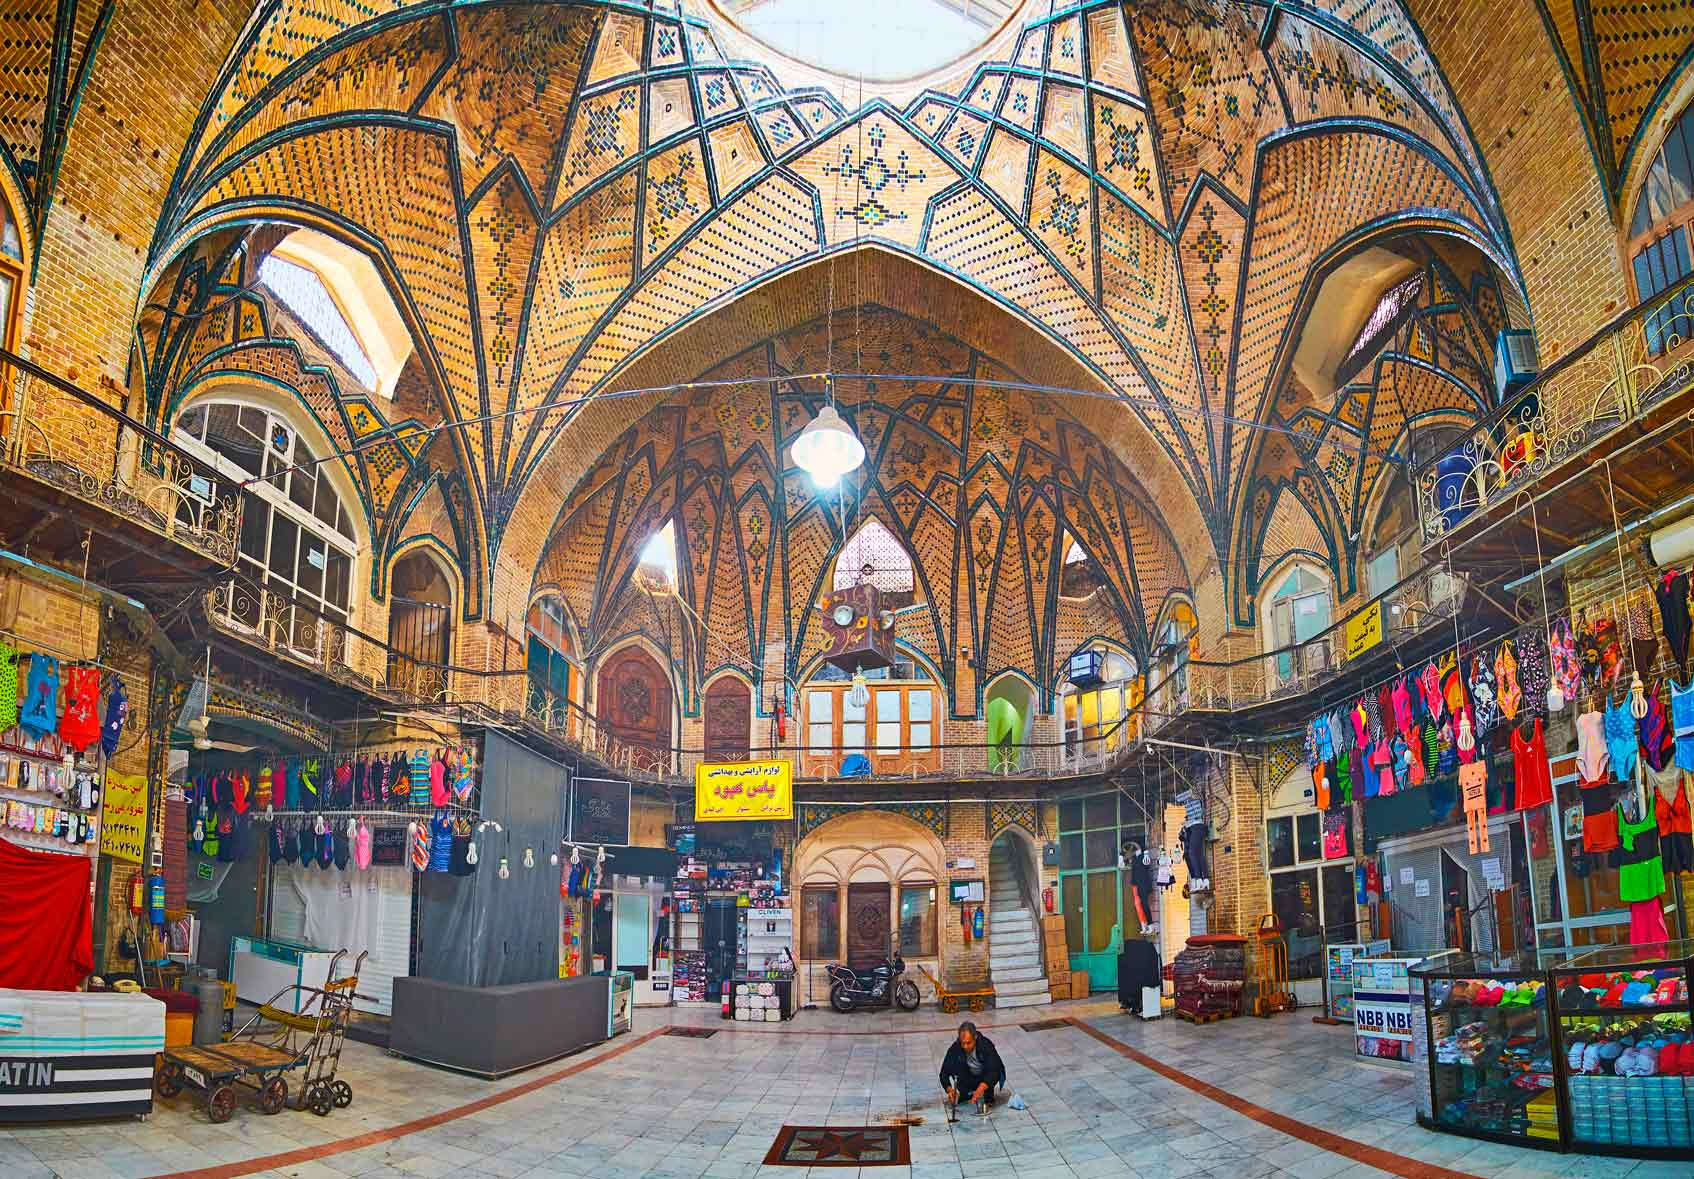 Иран надо ли носить хиджаб туристам